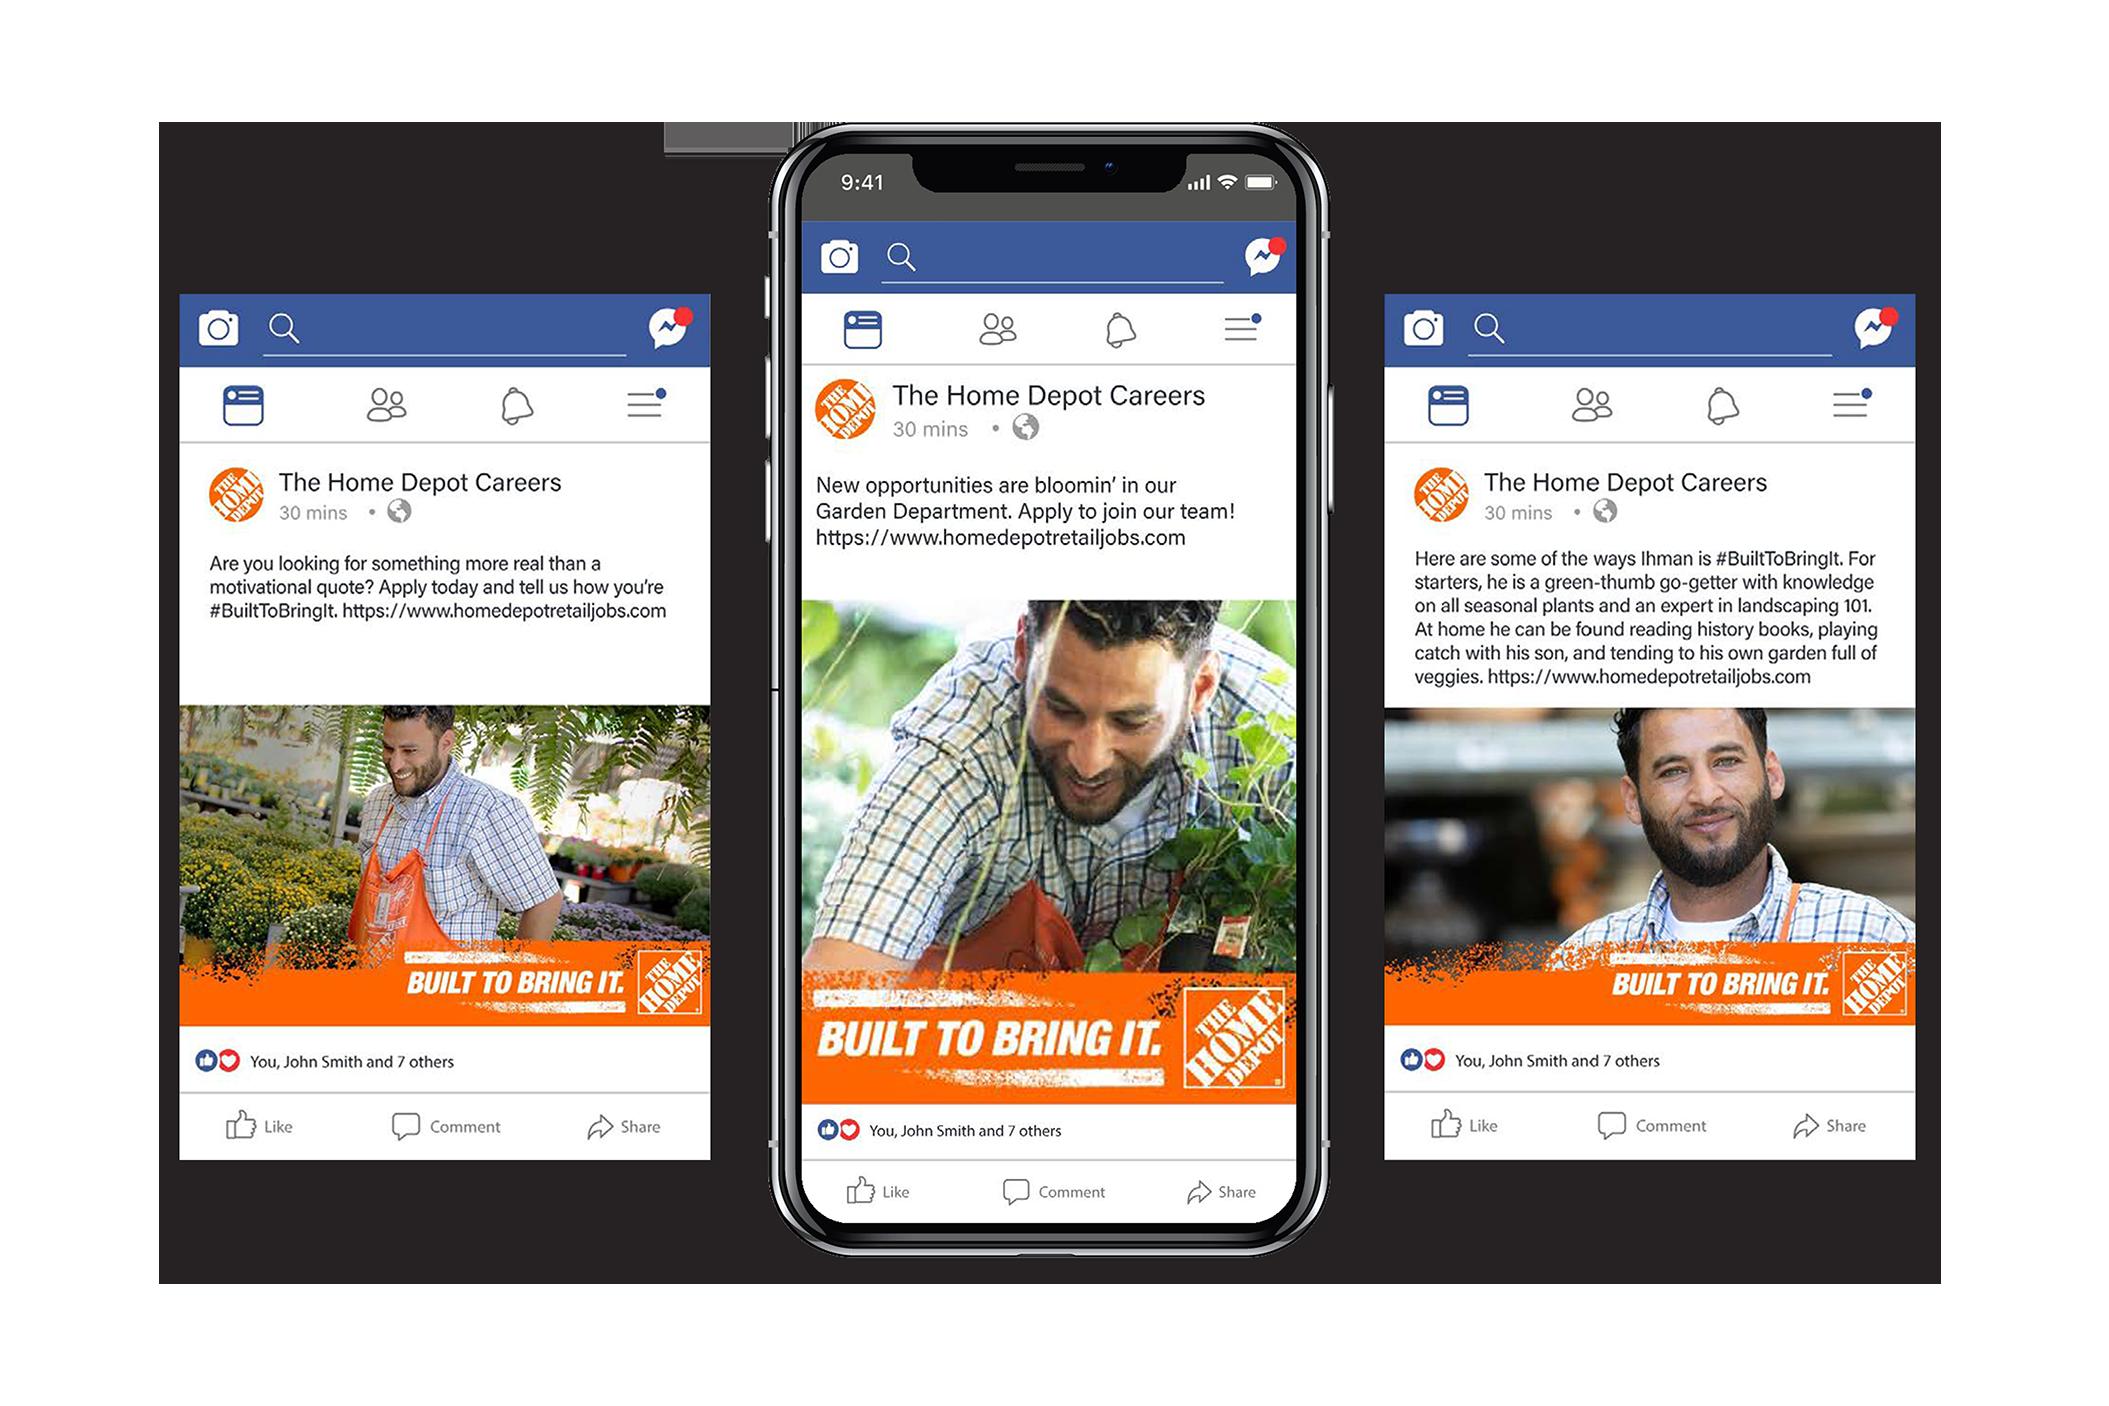 Home Depot — Built To Bring It social media story